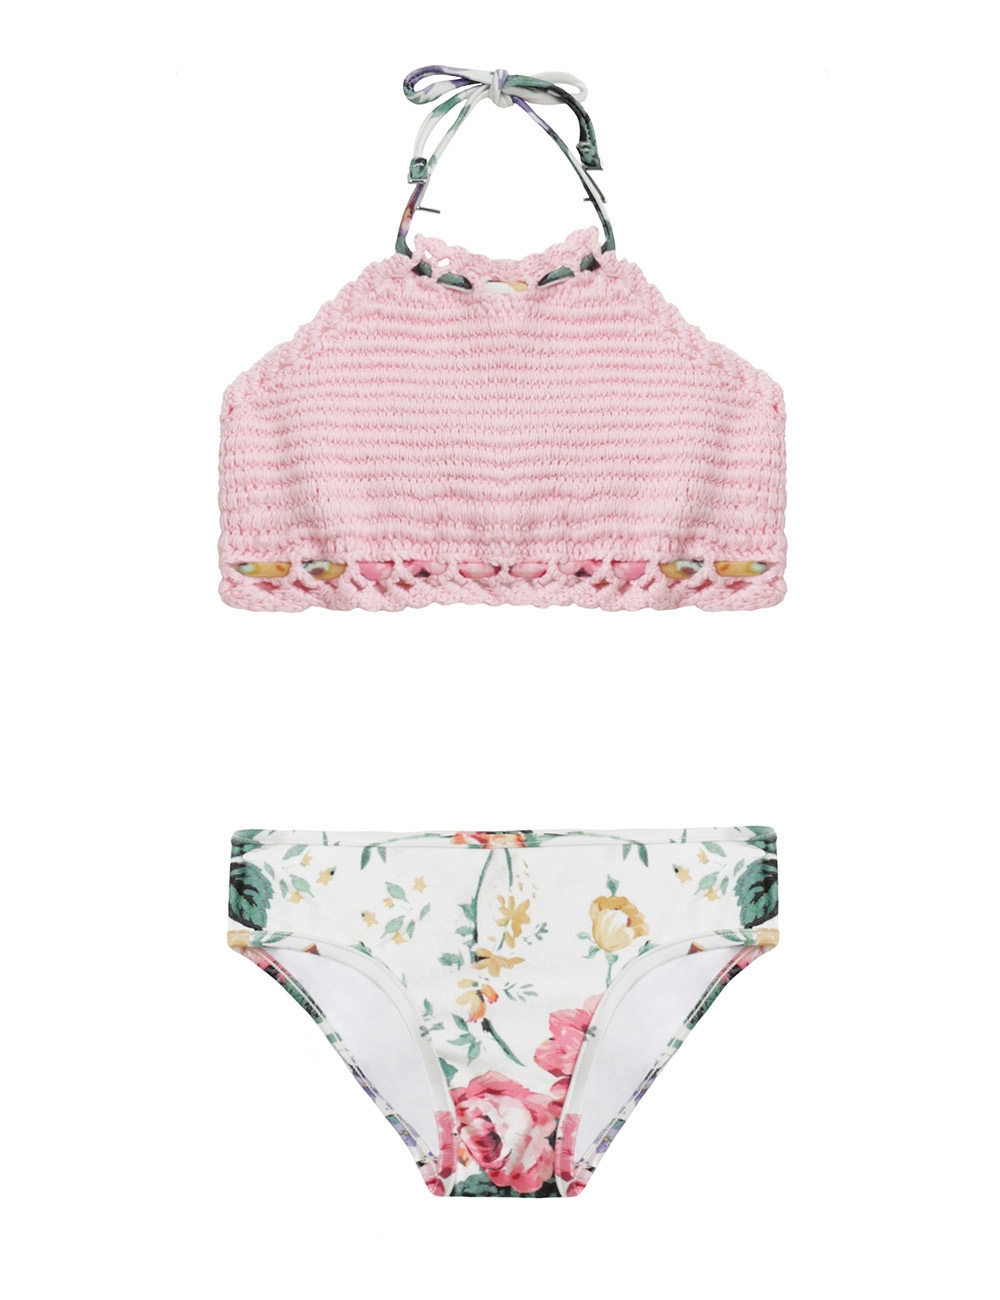 Allia Crochet Halter Bikini